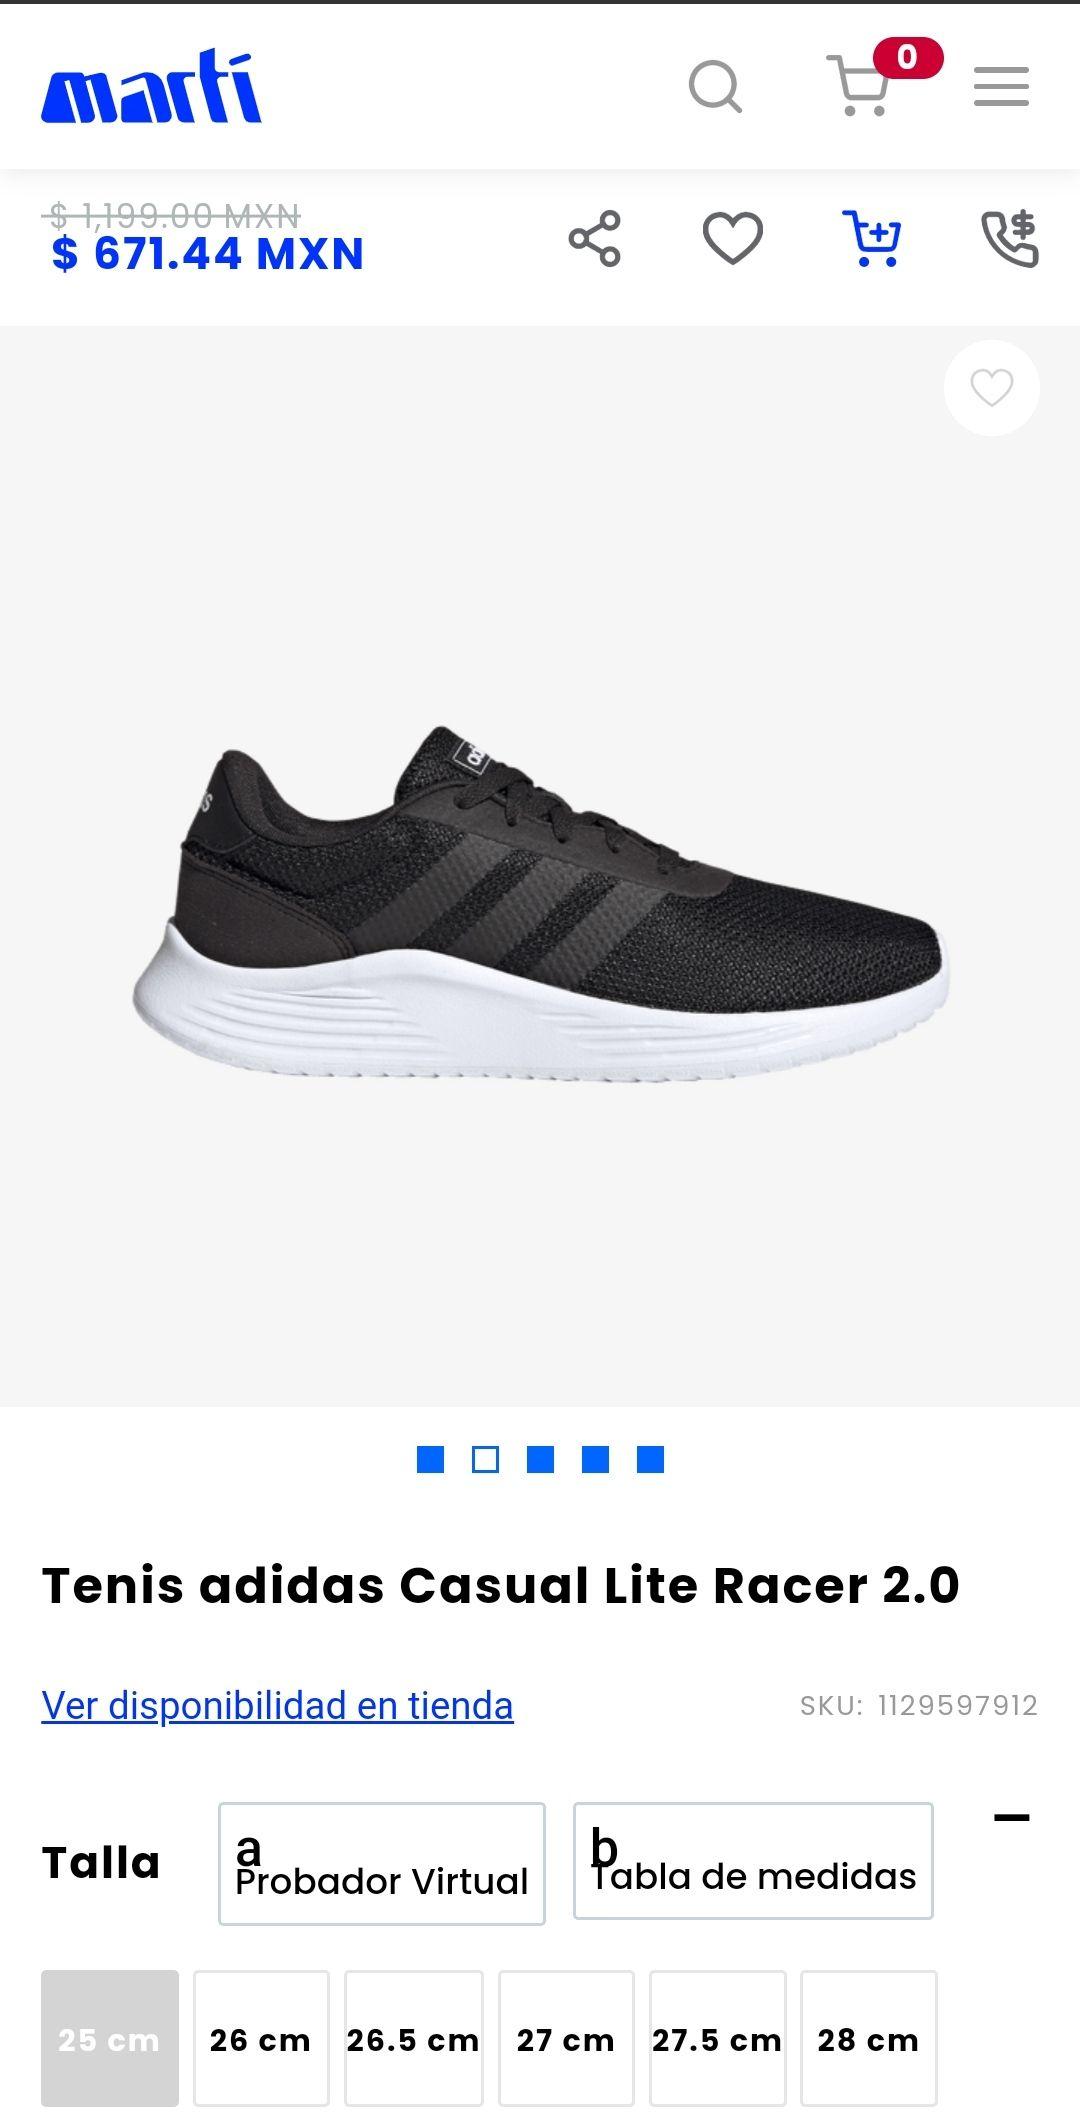 Adidas Lite Racer 2.0 en Marti